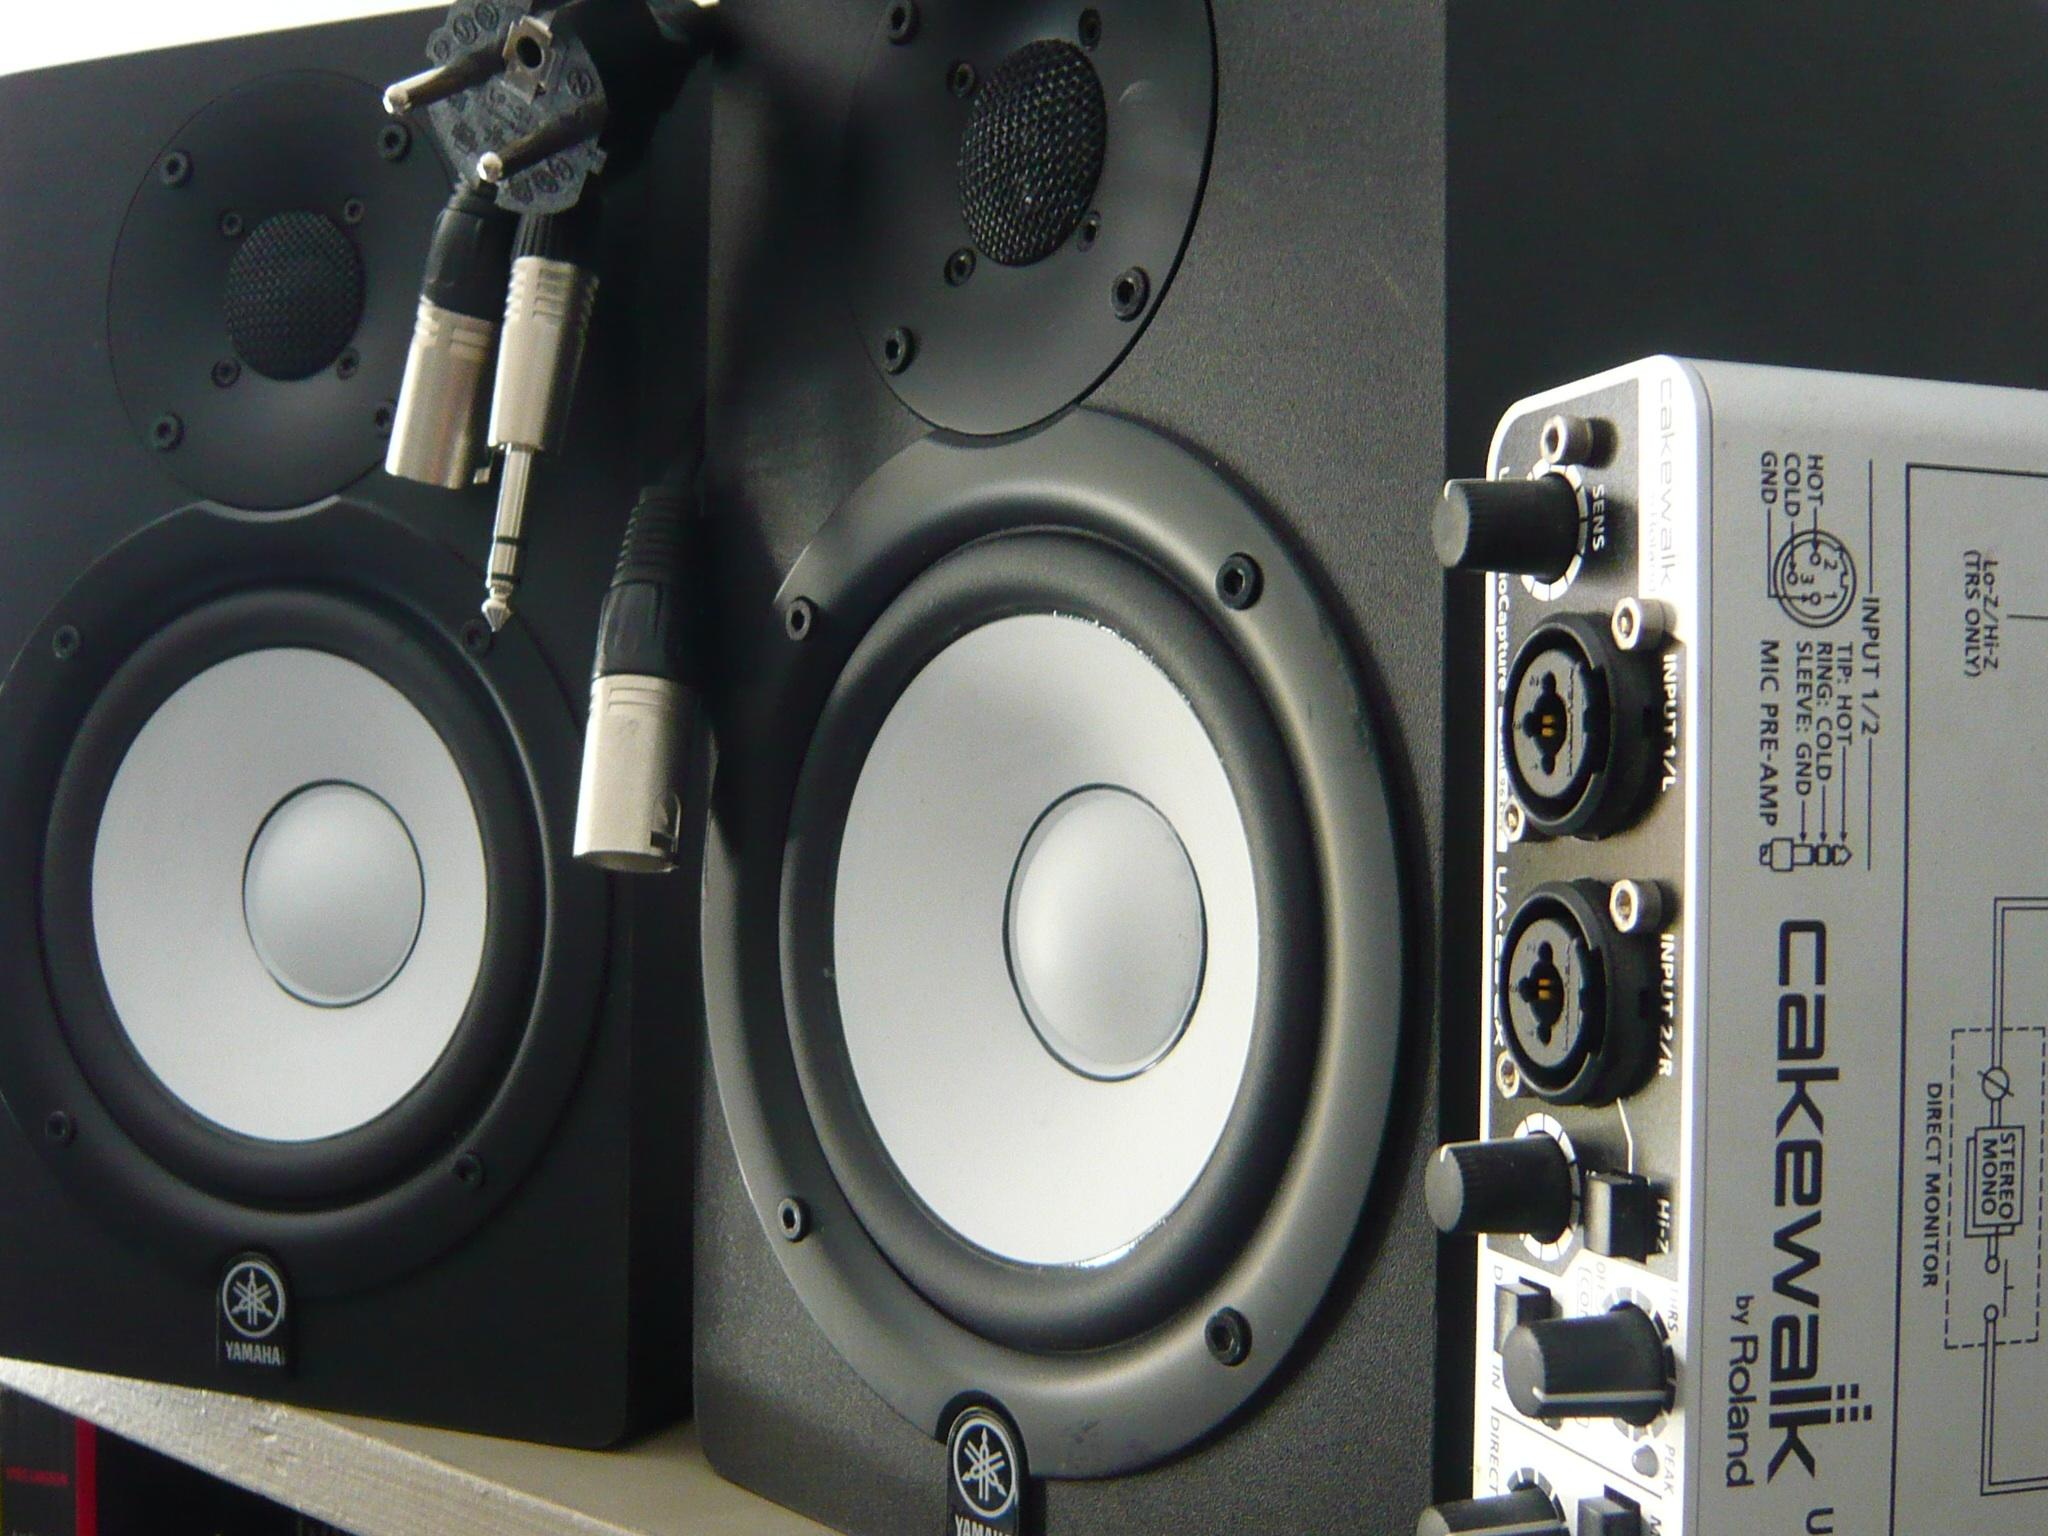 Yamaha hs50m image 562904 audiofanzine for Yamaha hs50m review